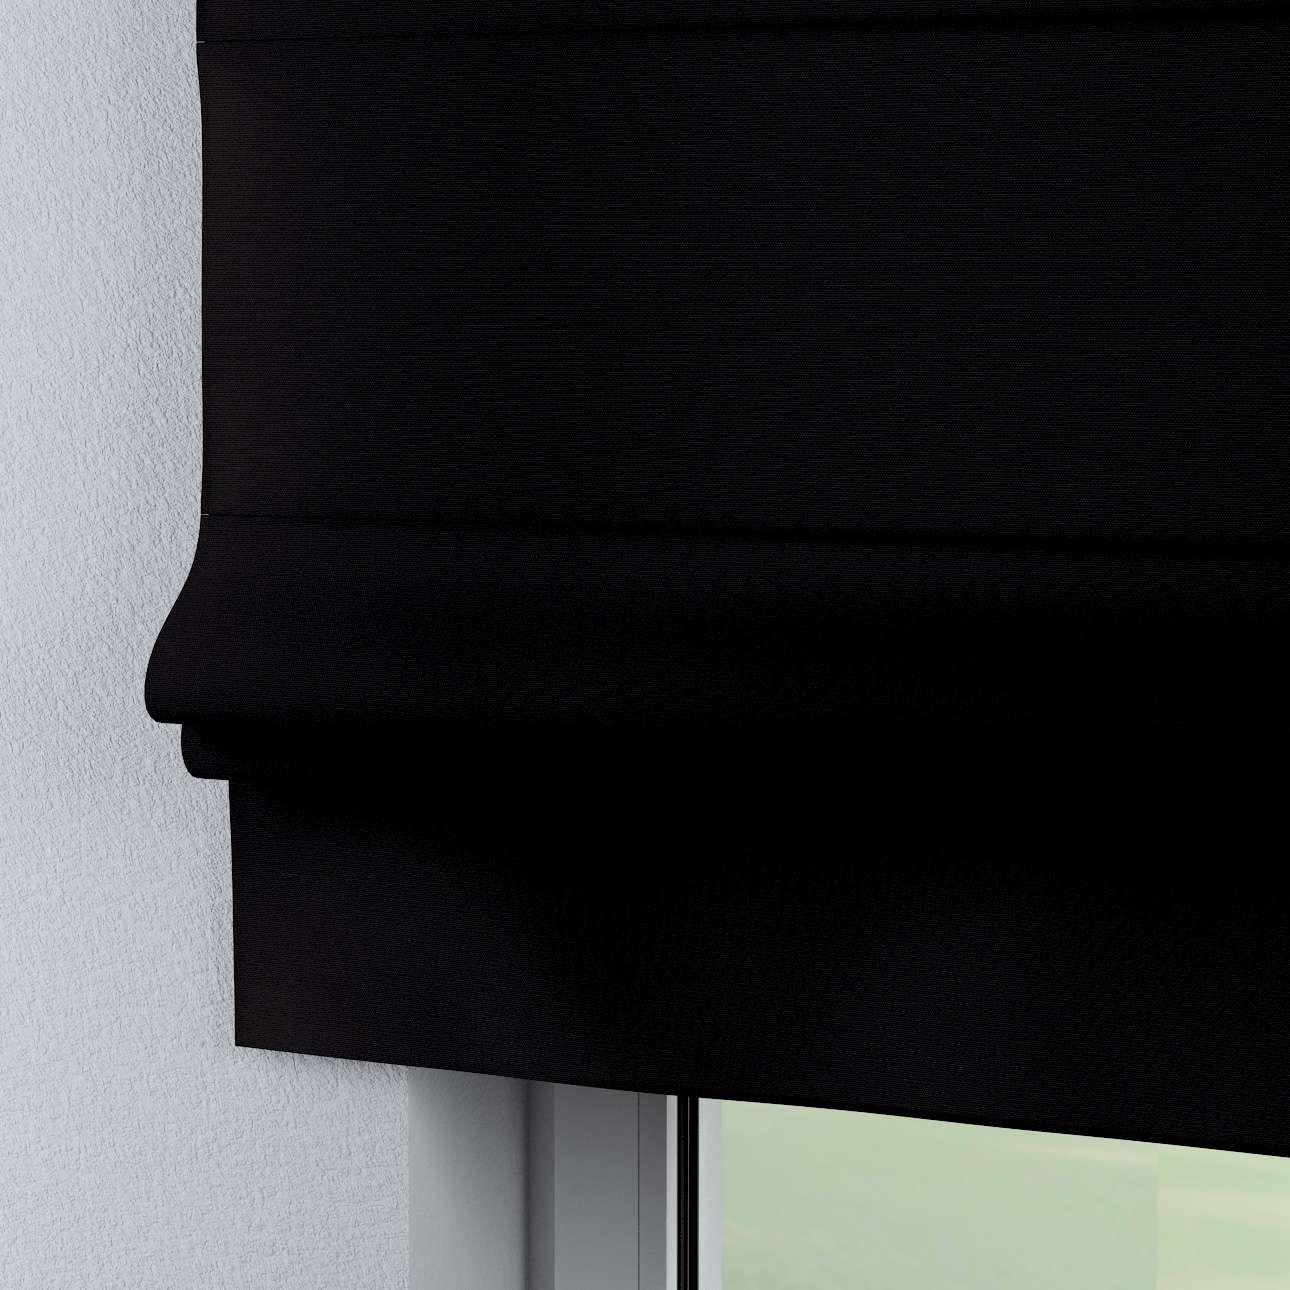 Raffrollo Padva 80 x 170 cm von der Kollektion Cotton Panama, Stoff: 702-09